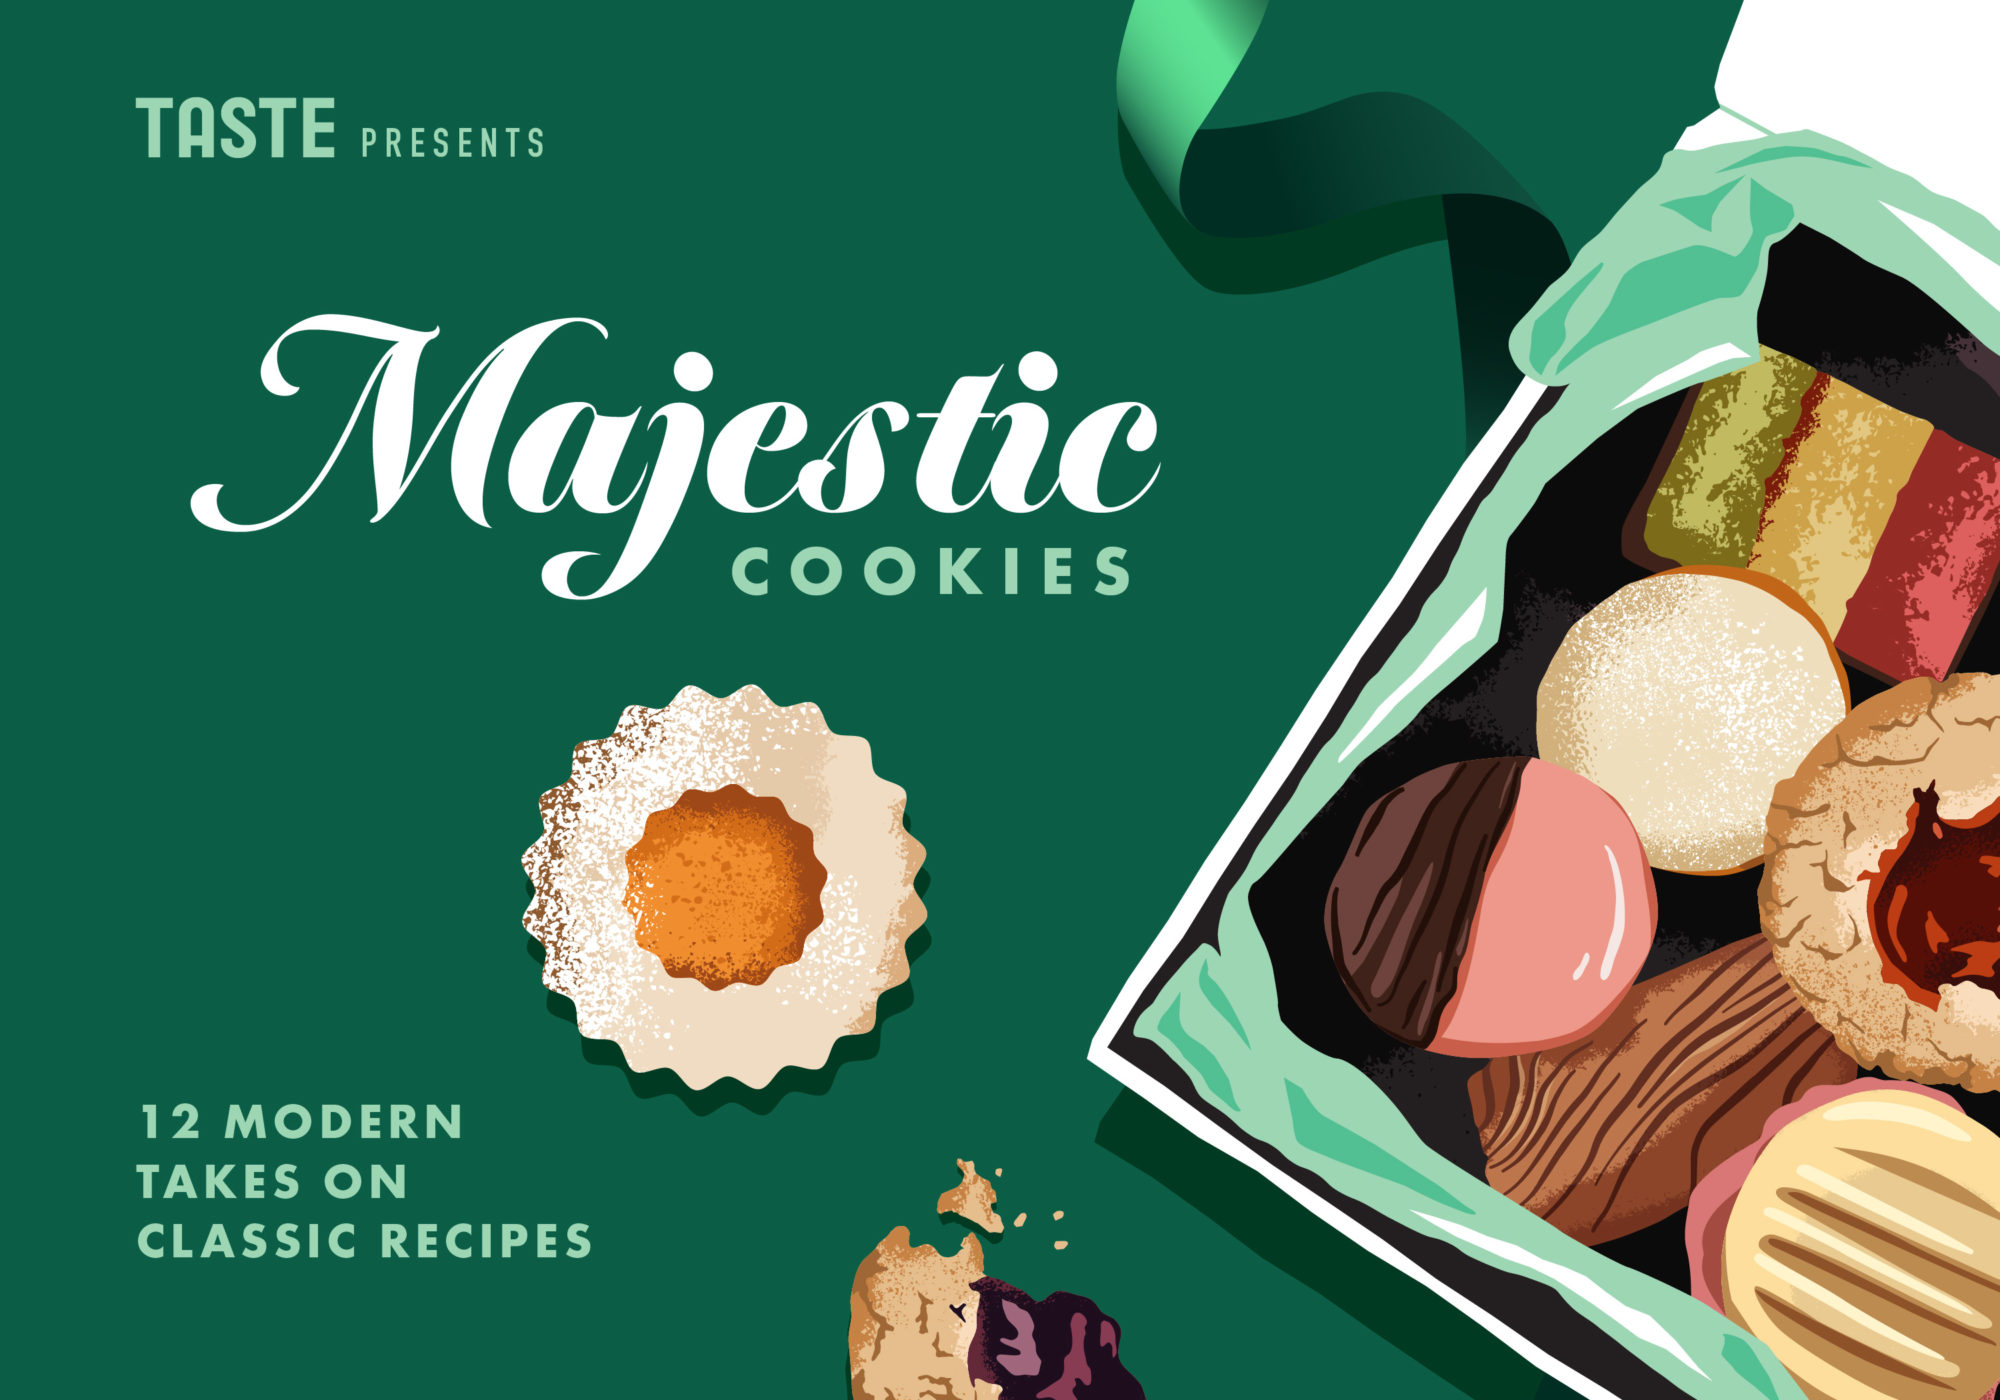 TASTE_majestic_cookies_10x7_static